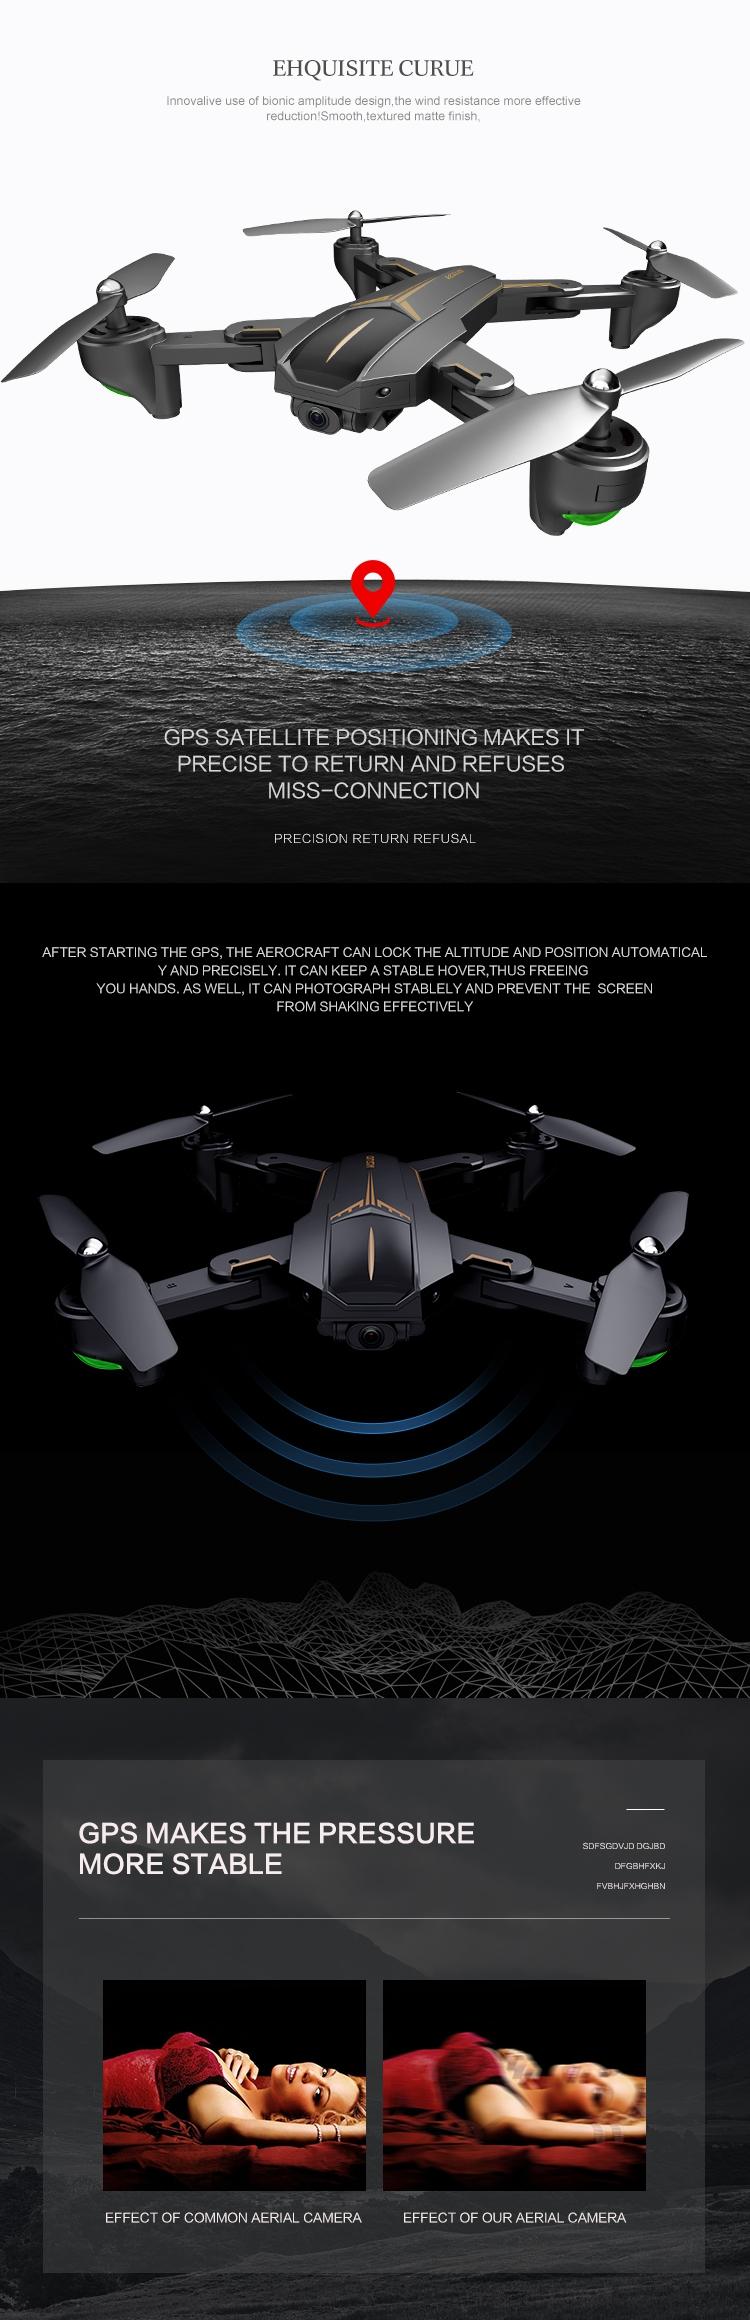 VISUO XS812 GPS 5G WiFi FPV w/ 5MP/4K HD Camera 15mins Flight Time Foldable  RC Drone Quadcopter RTF